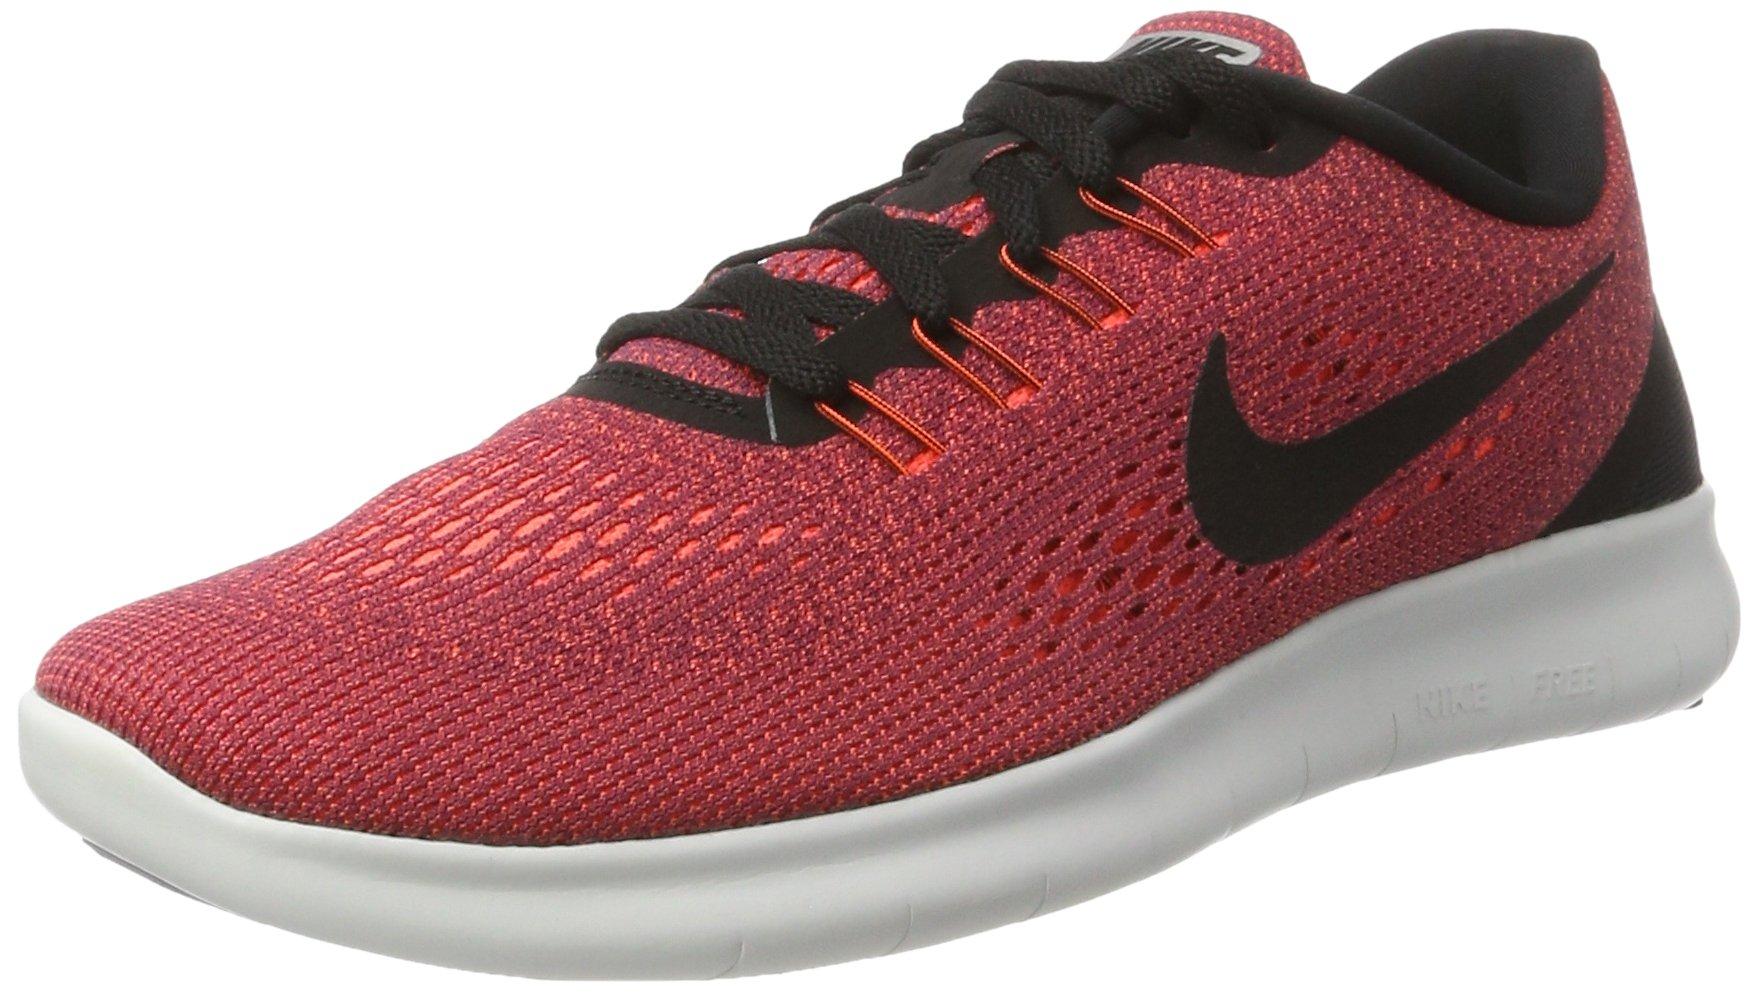 NIKE Free RN Mens Running Trainers 831508 Sneakers Shoes (UK 6 US 7 EU 40, Hyper Orange Black 803)